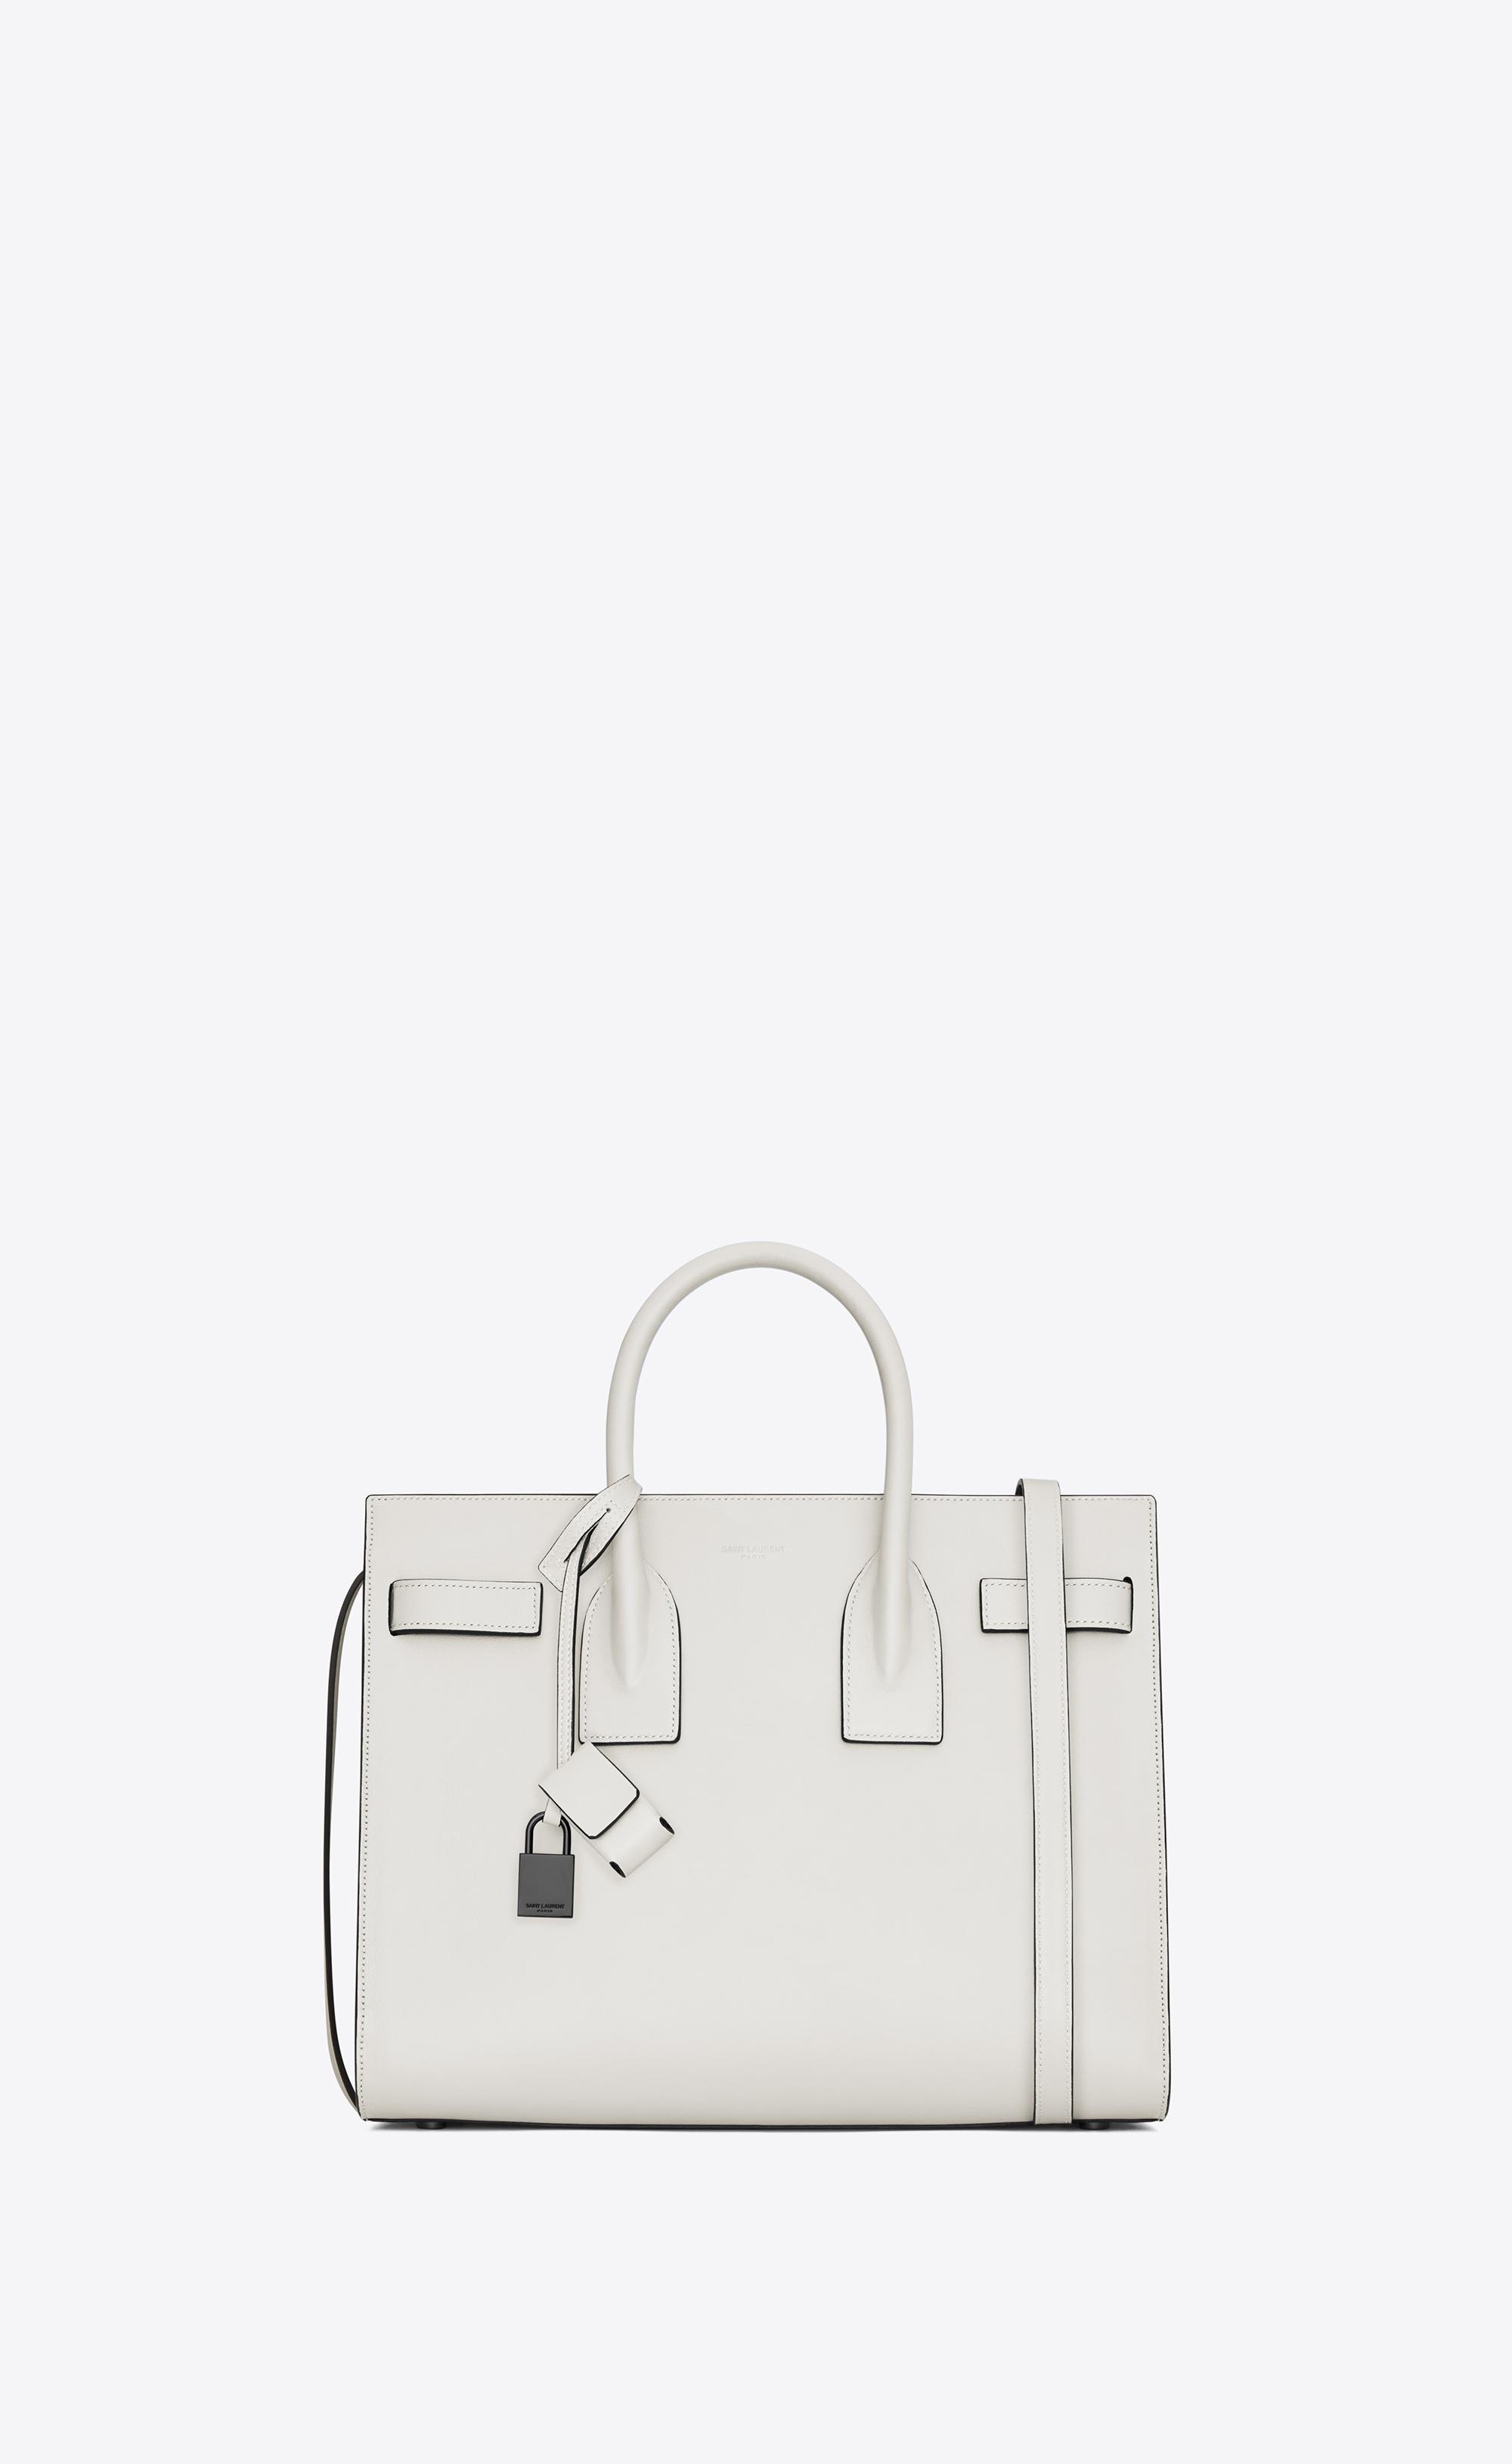 07271cece2 Saint Laurent Classic Small Sac De Jour Bag In Dove White And Black ...